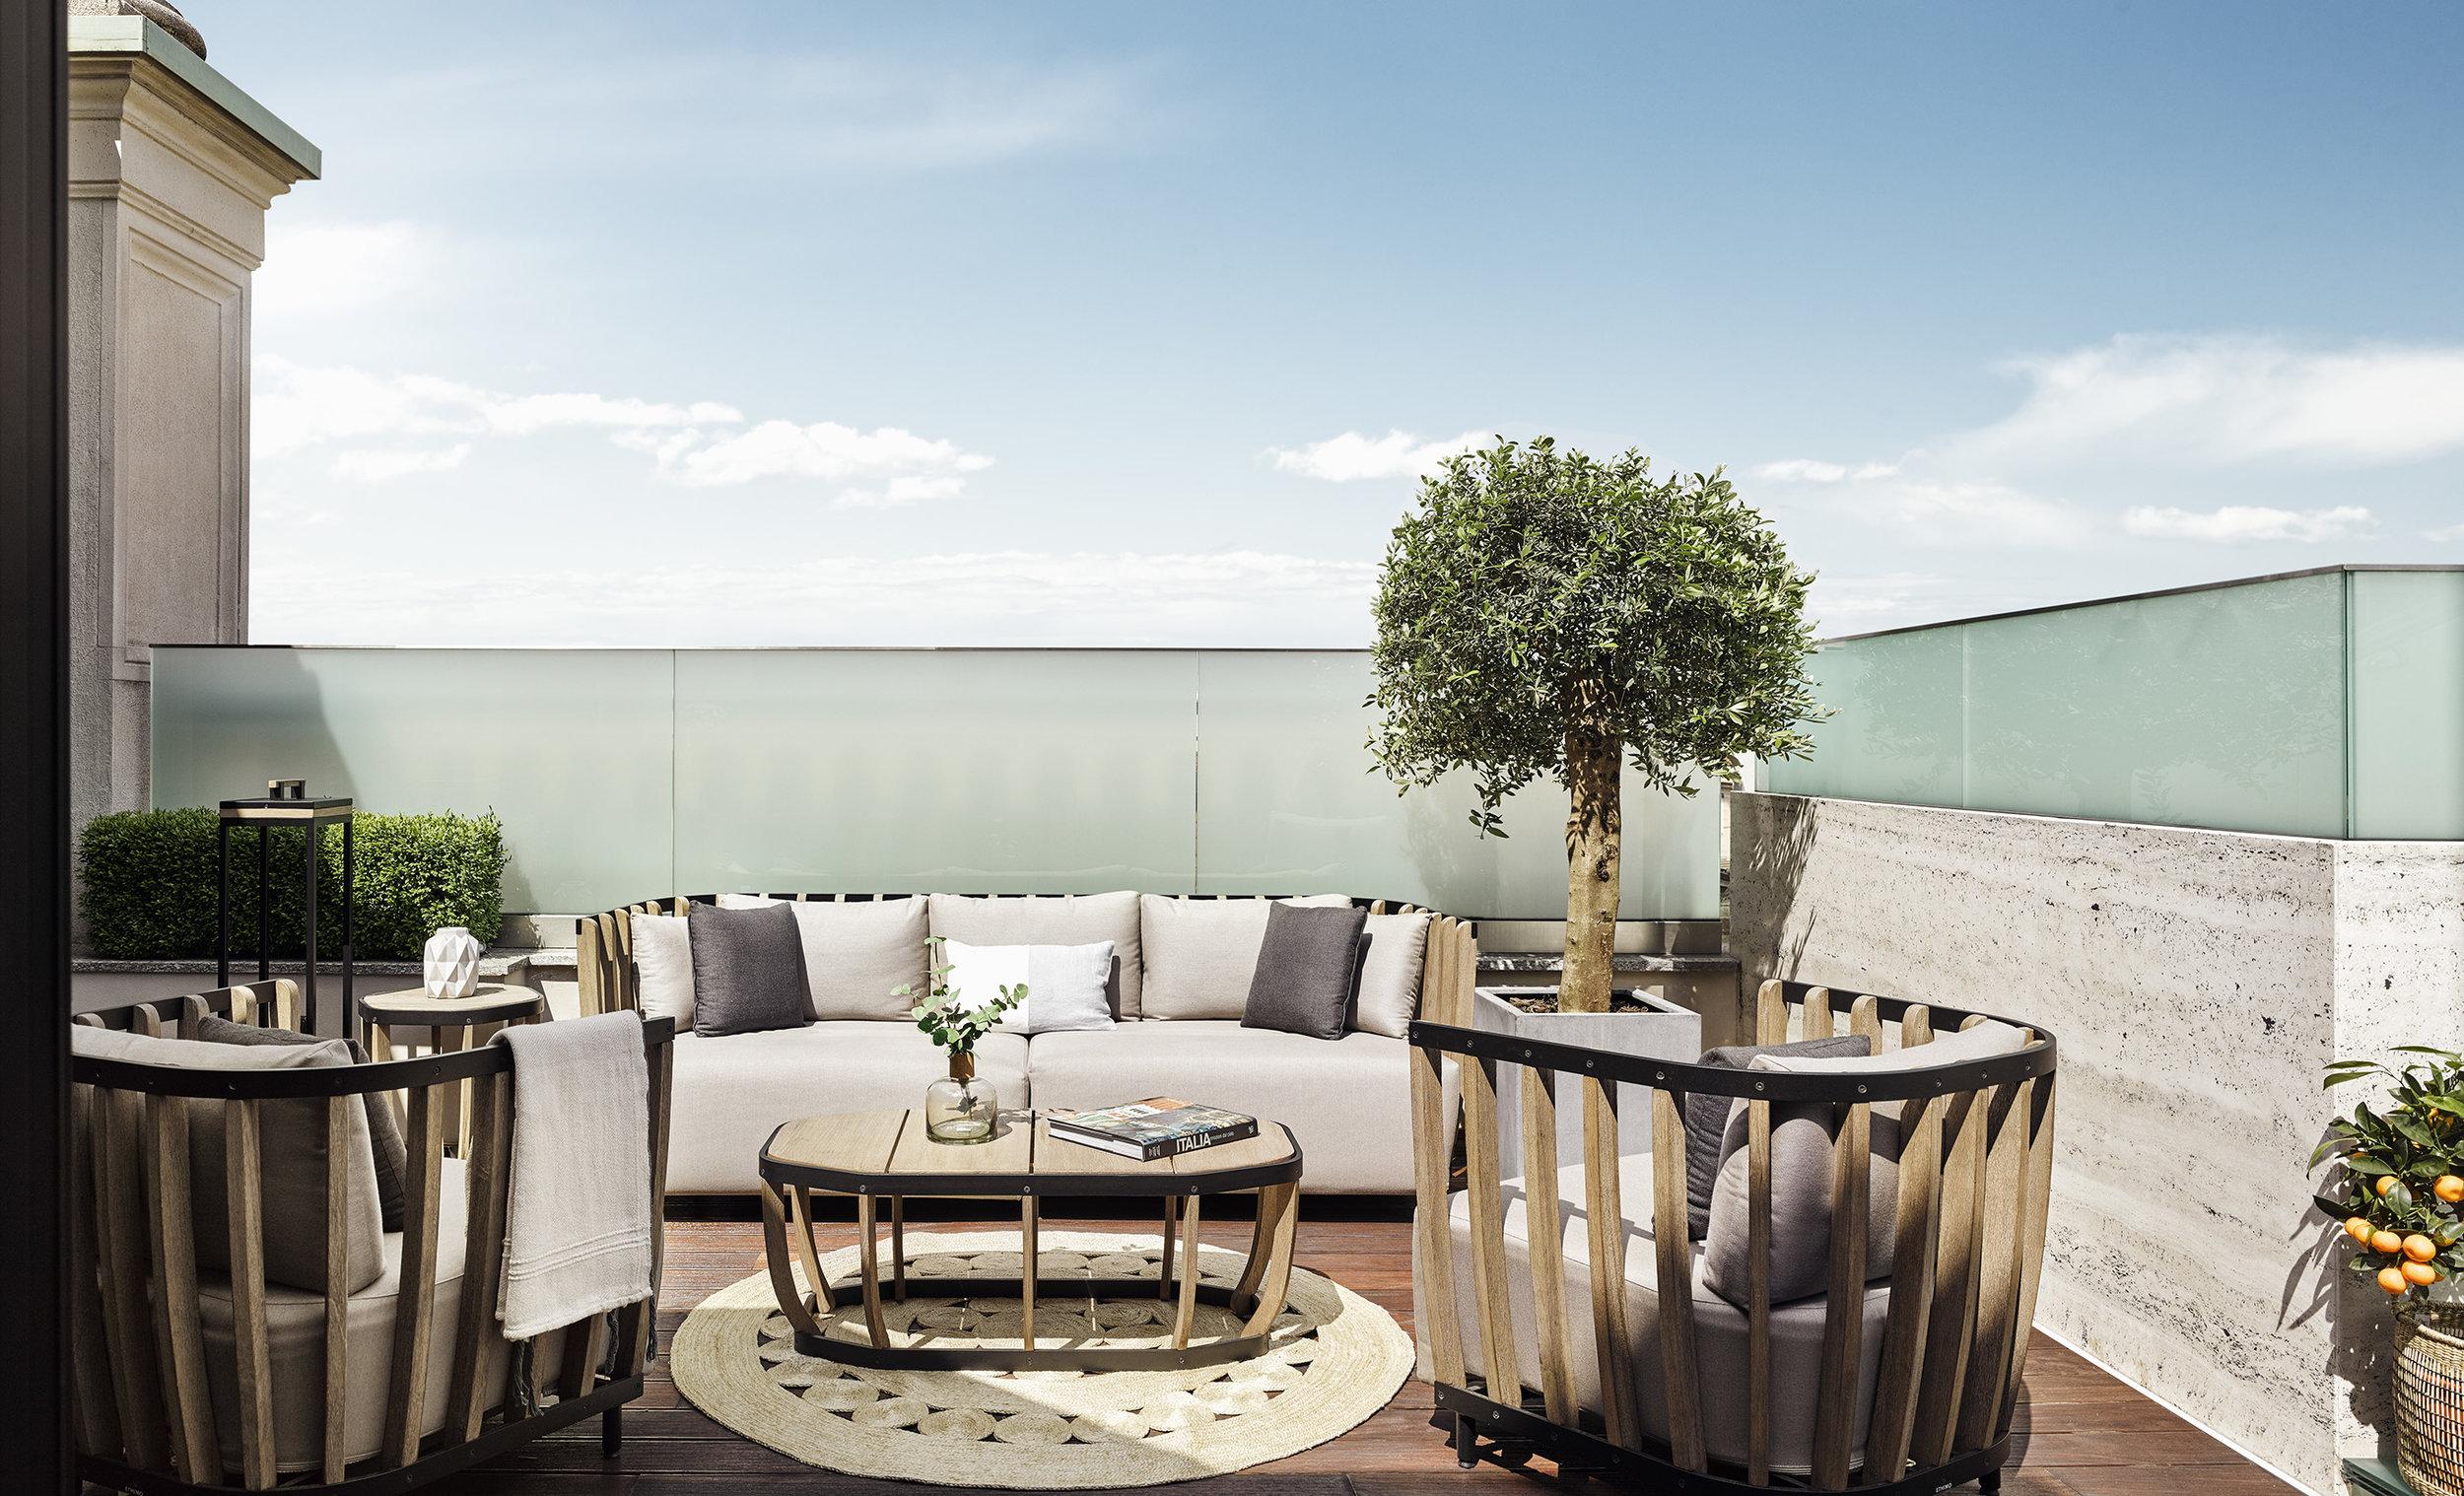 Park-Hyatt-Milano-DuomoSuite-Terrace.jpg